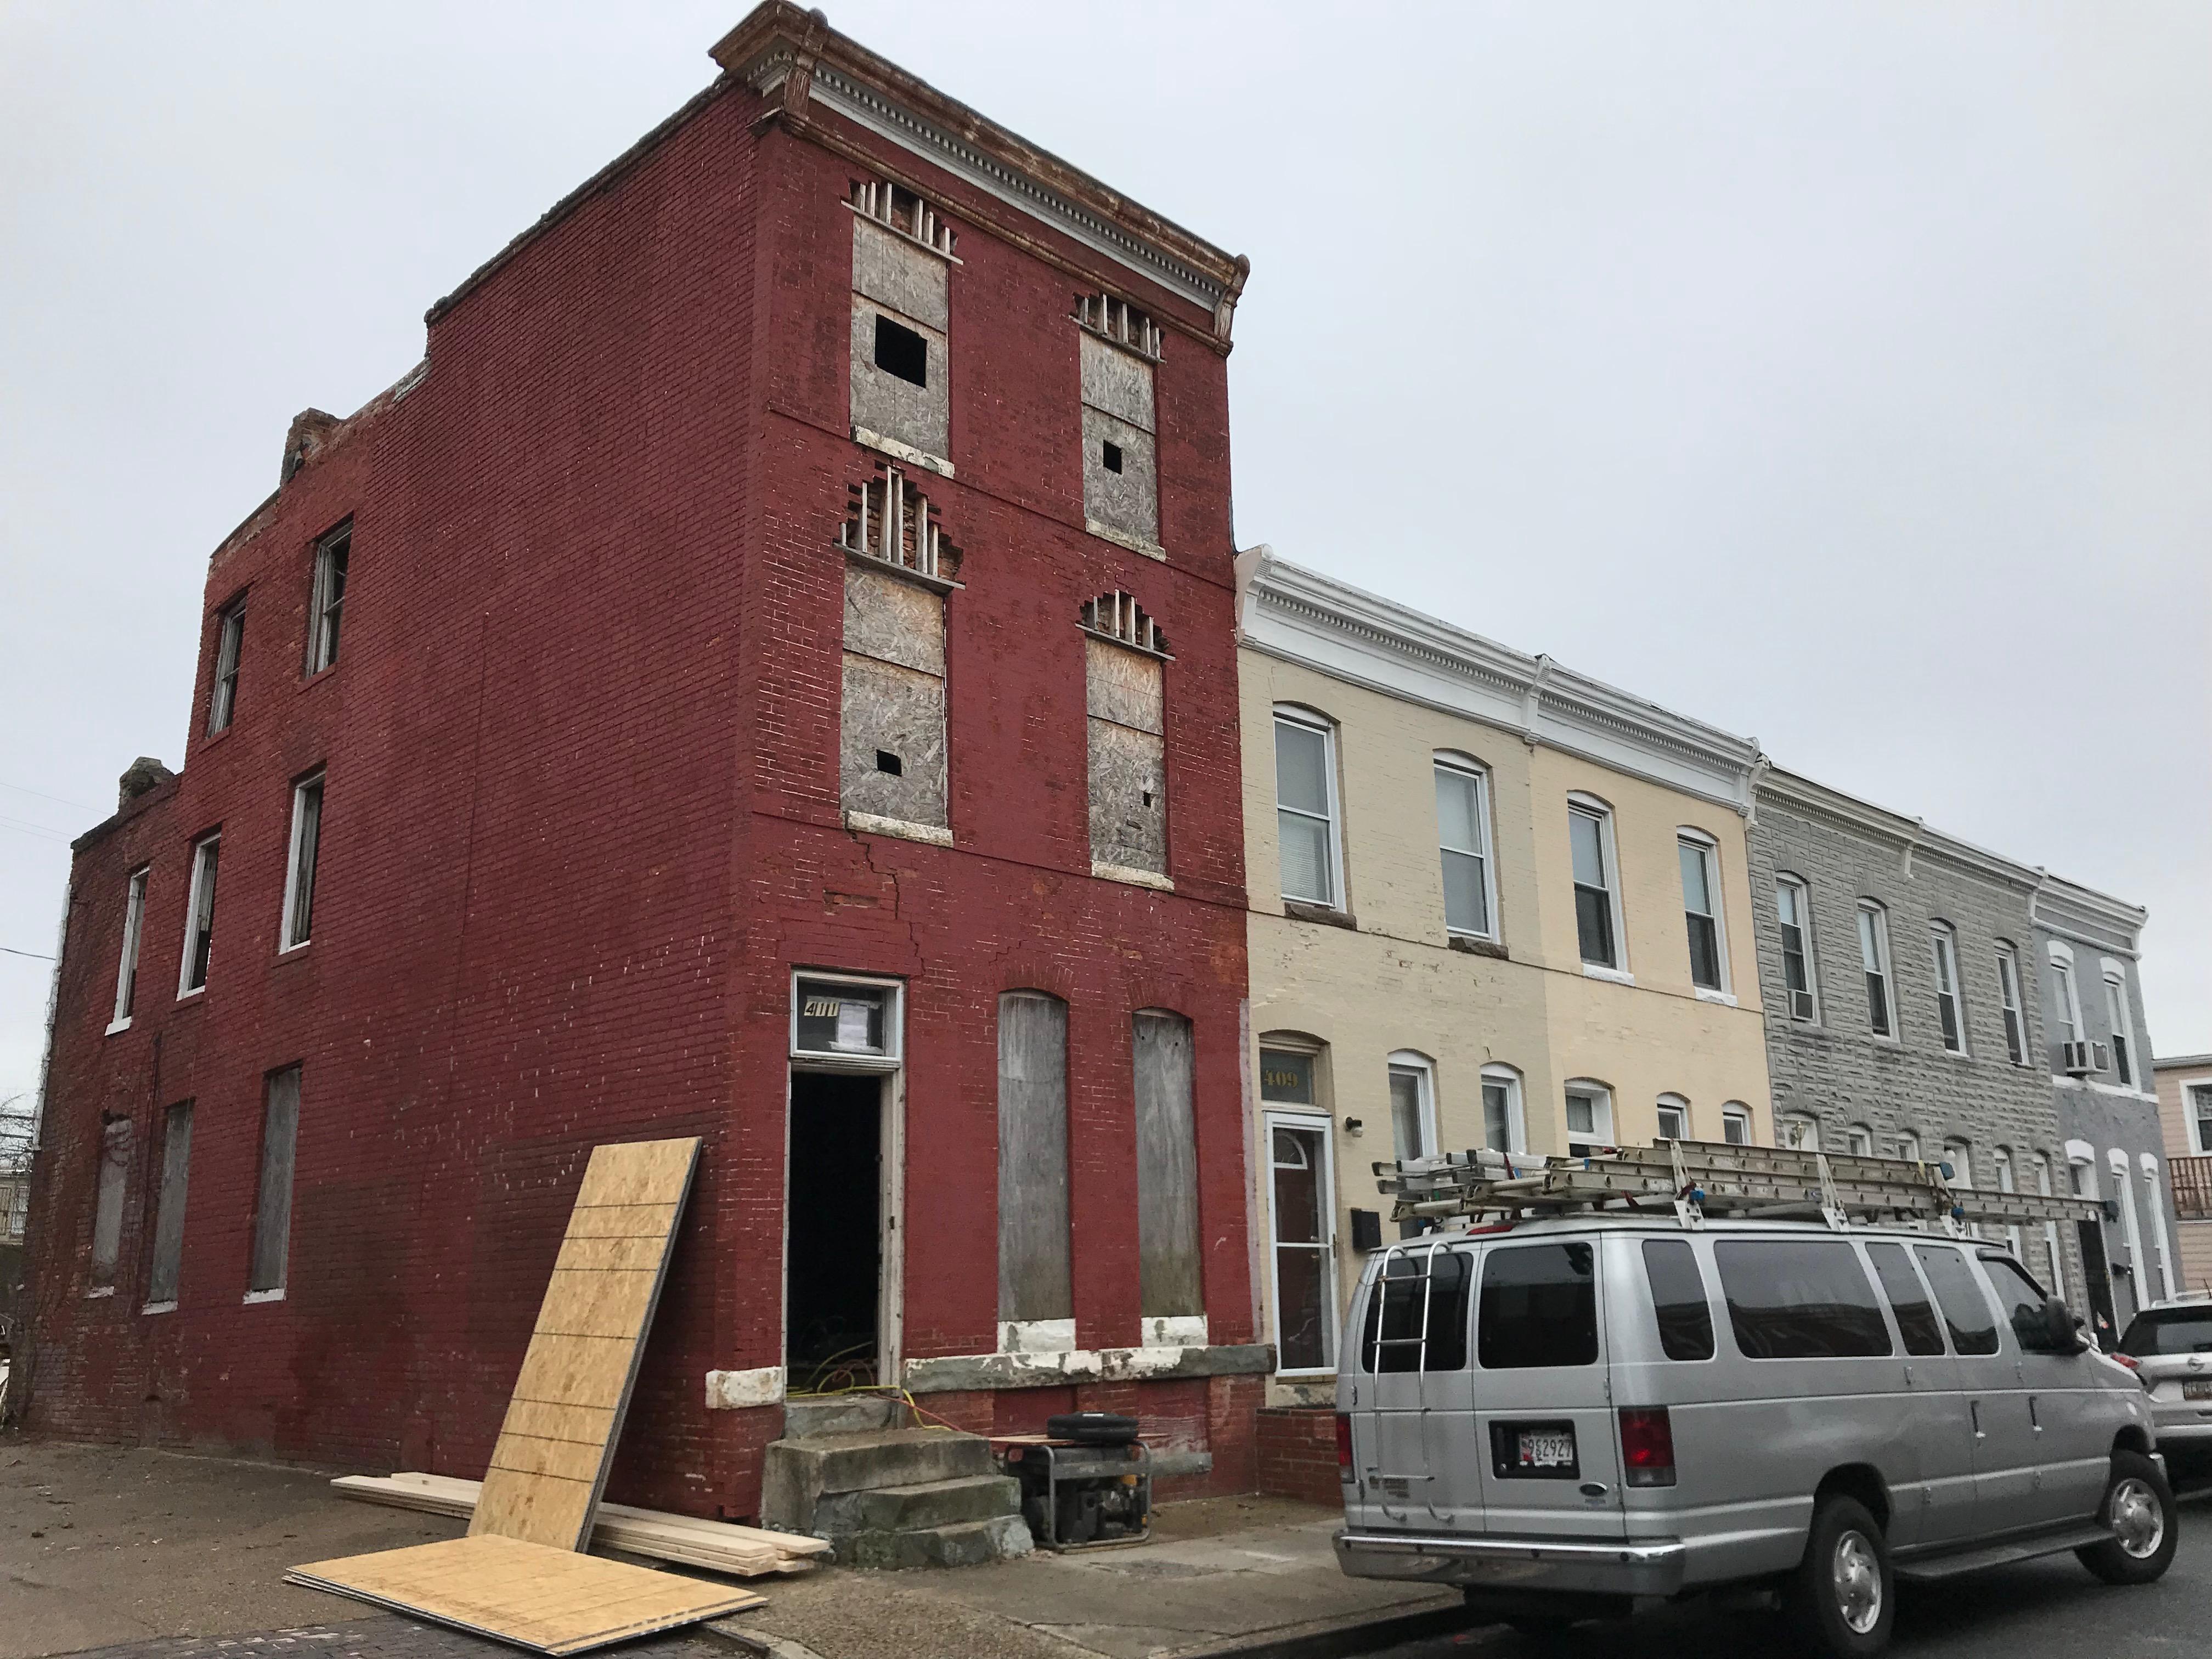 Rowhouse rehabilitation in progress, 411 e. 27th street, baltimore, md 21218 photo